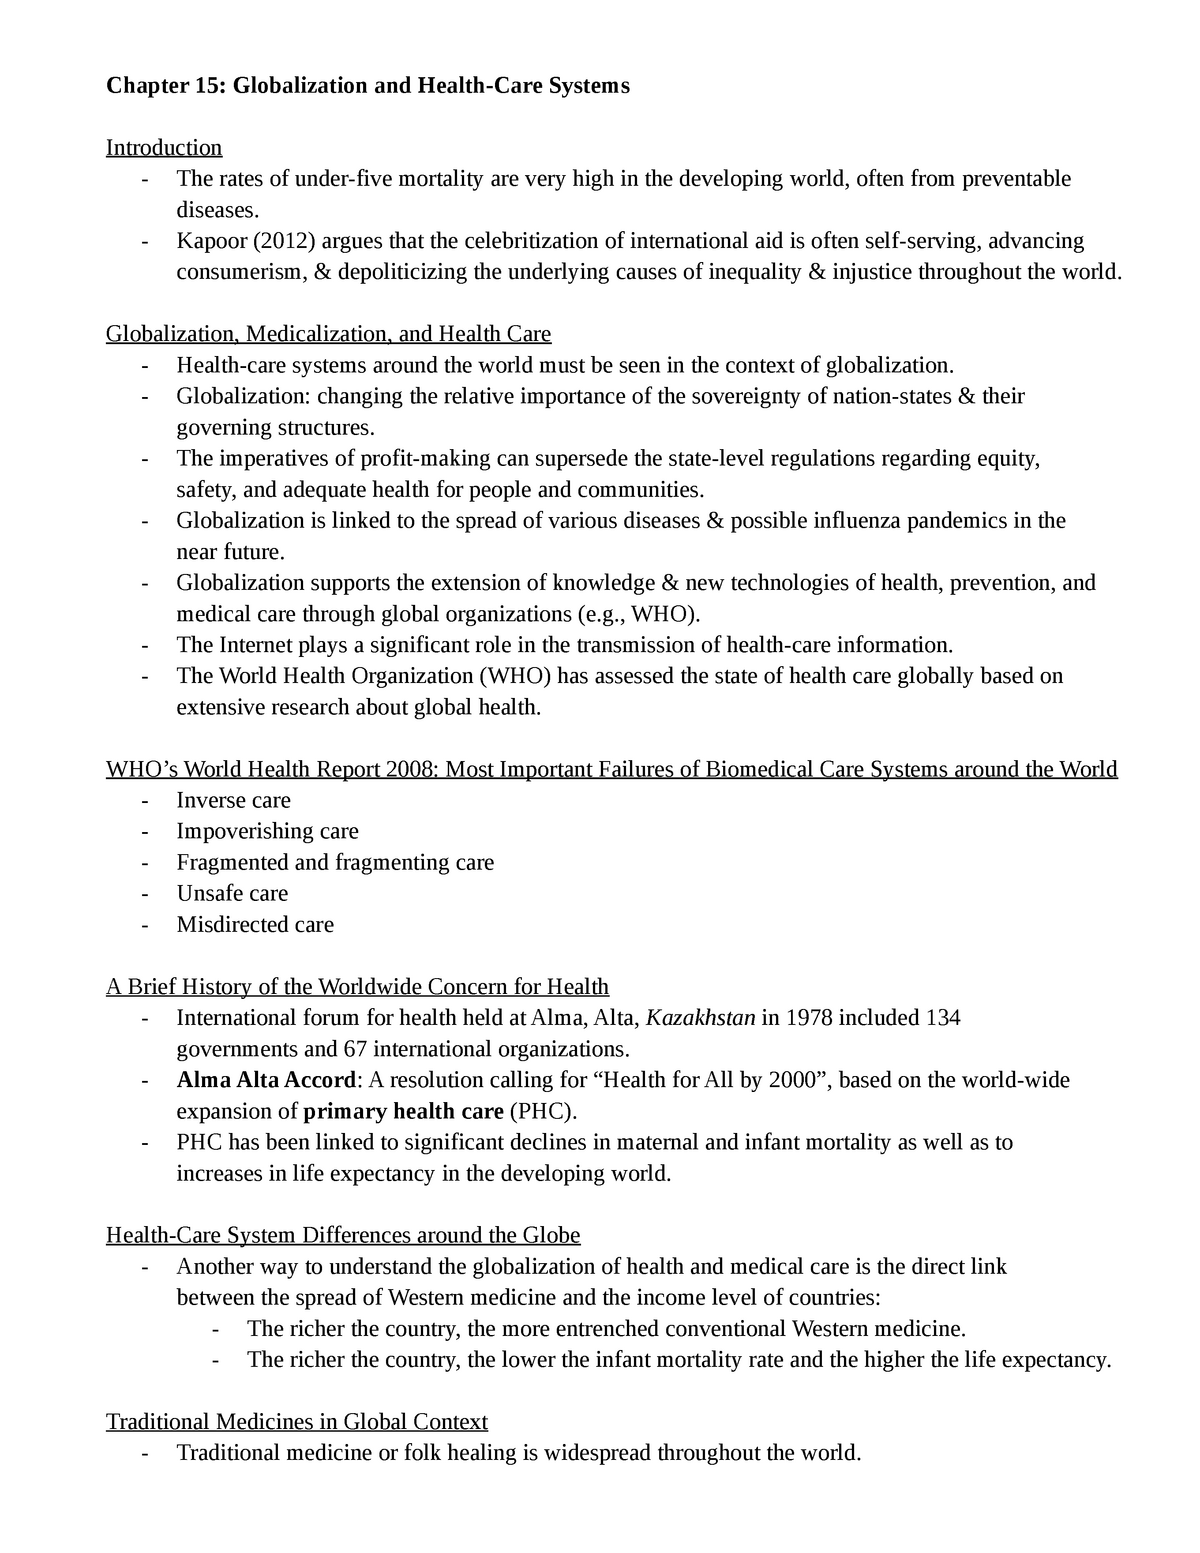 Quiz 2 - Quiz 2 - Soci 2050: Sociology of Health - StuDocu